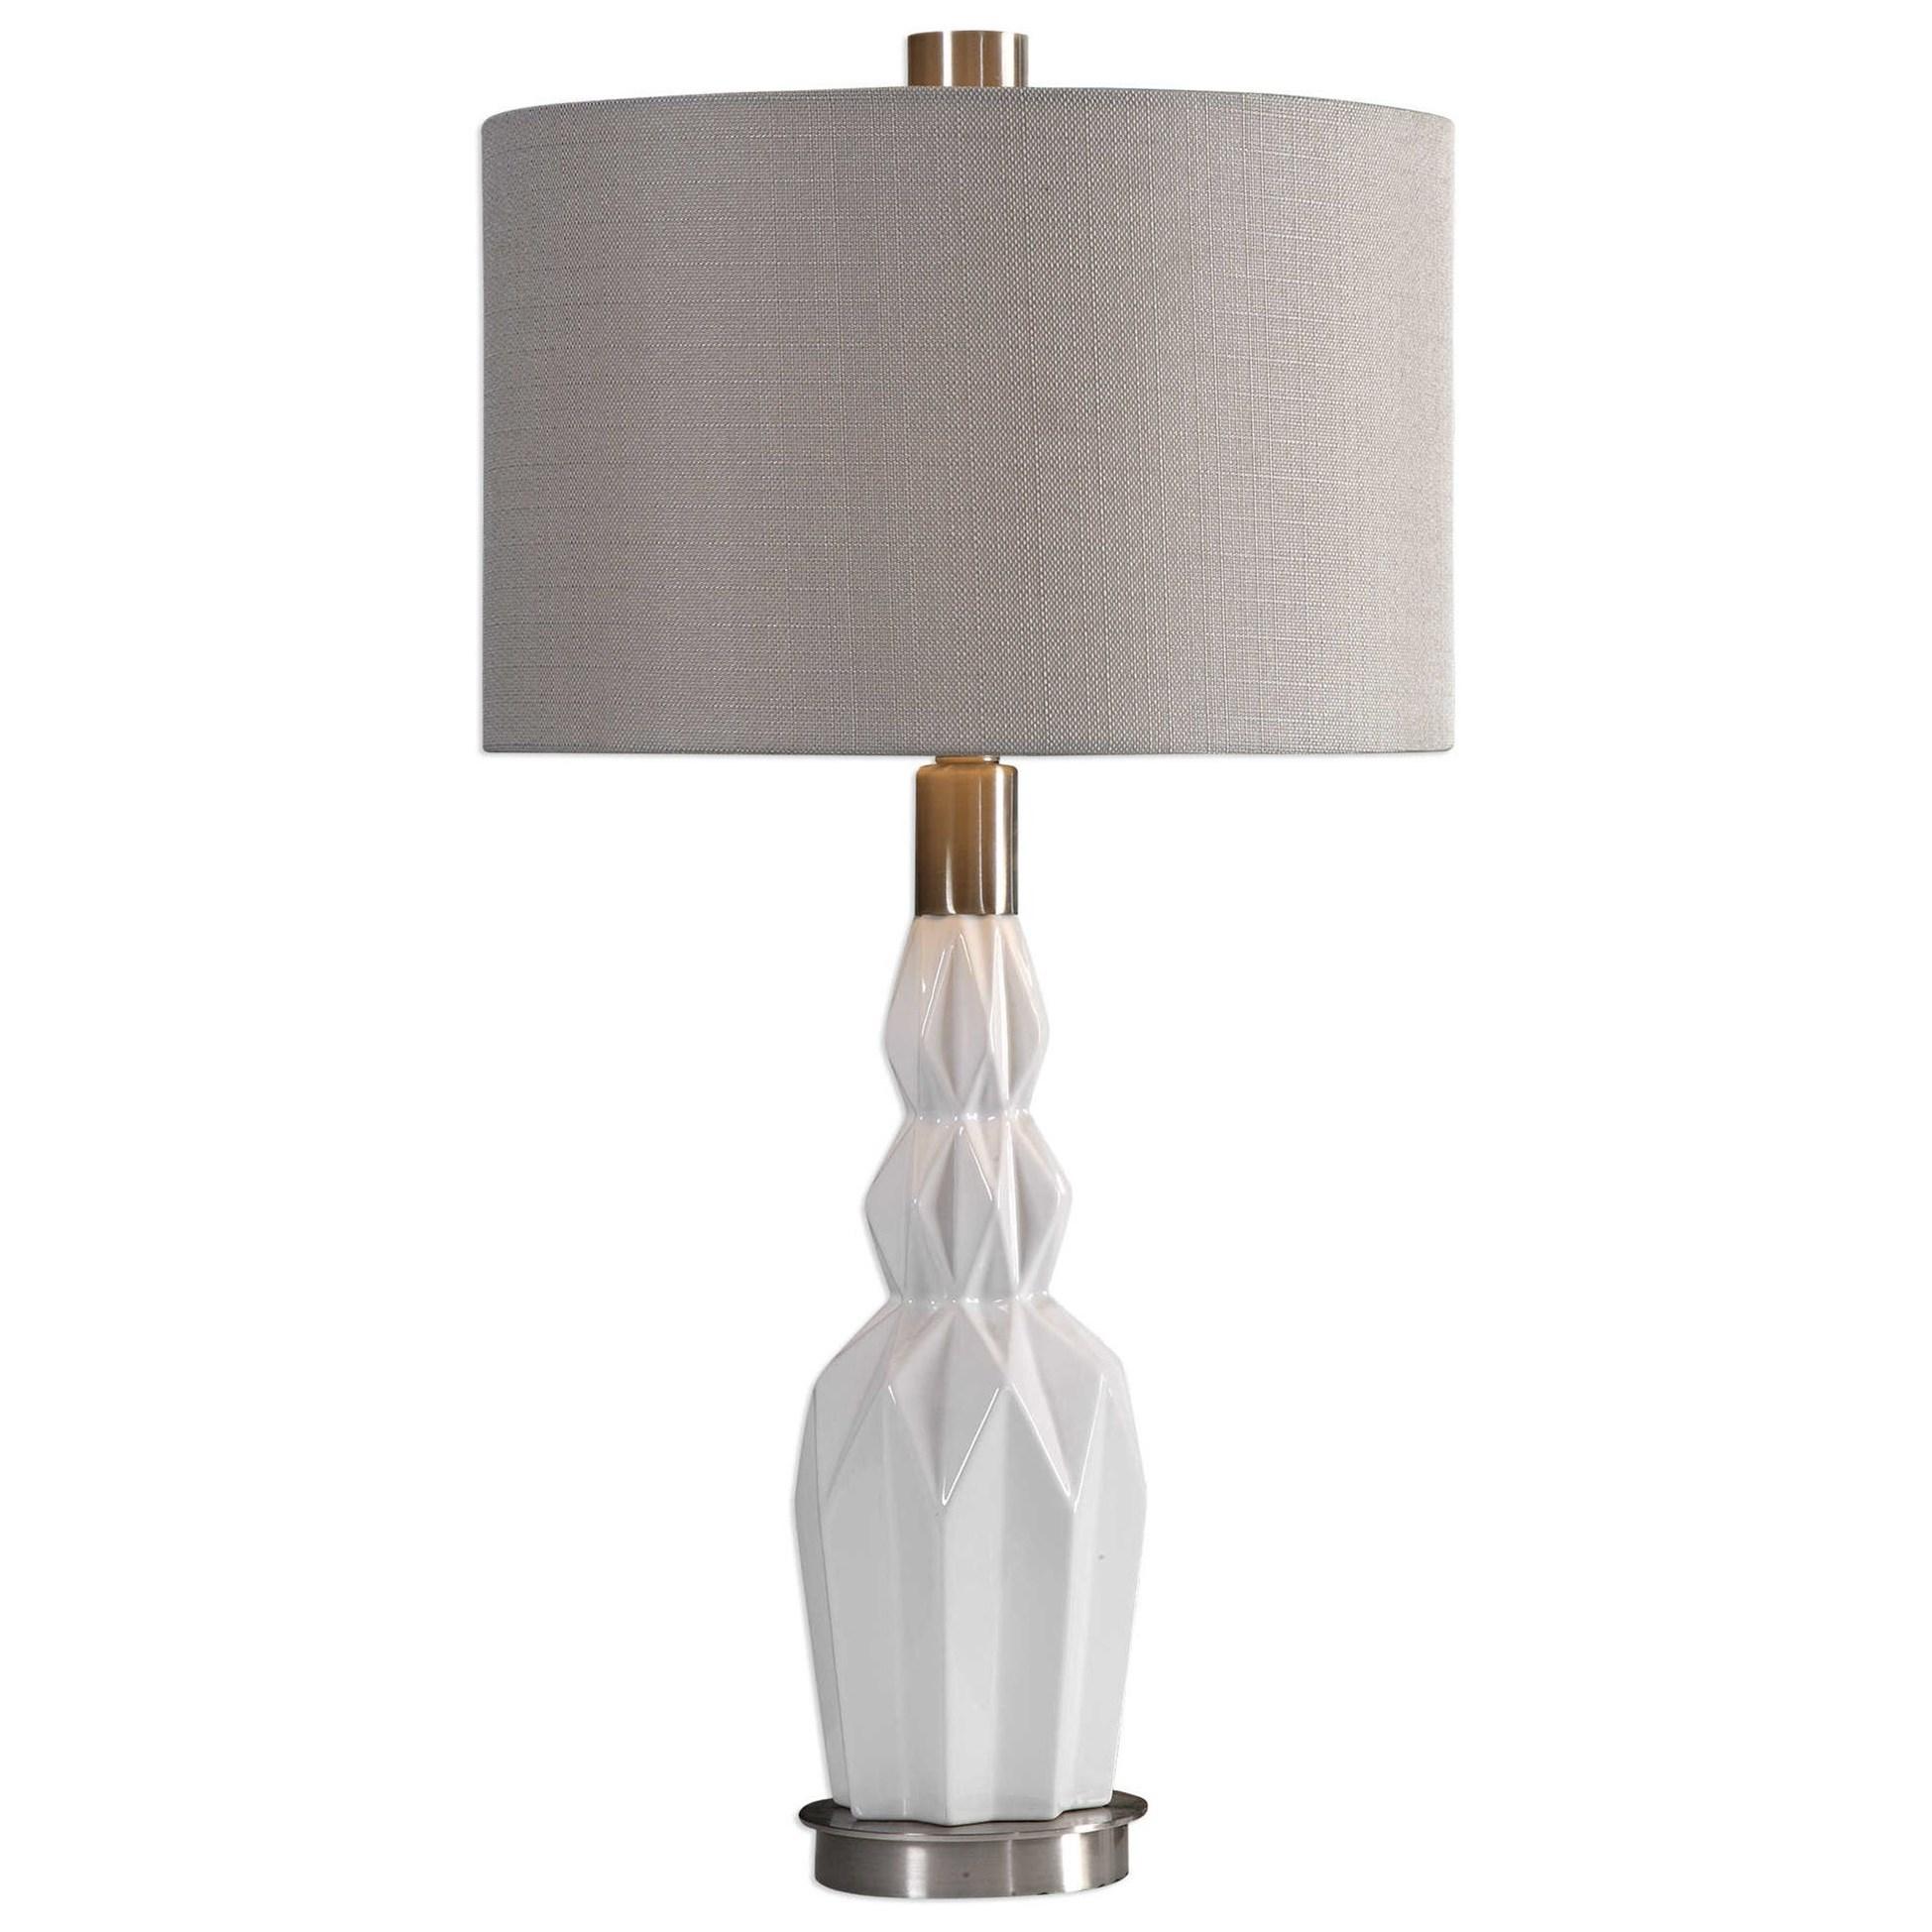 Cabret Gloss White Ceramic Table Lamp